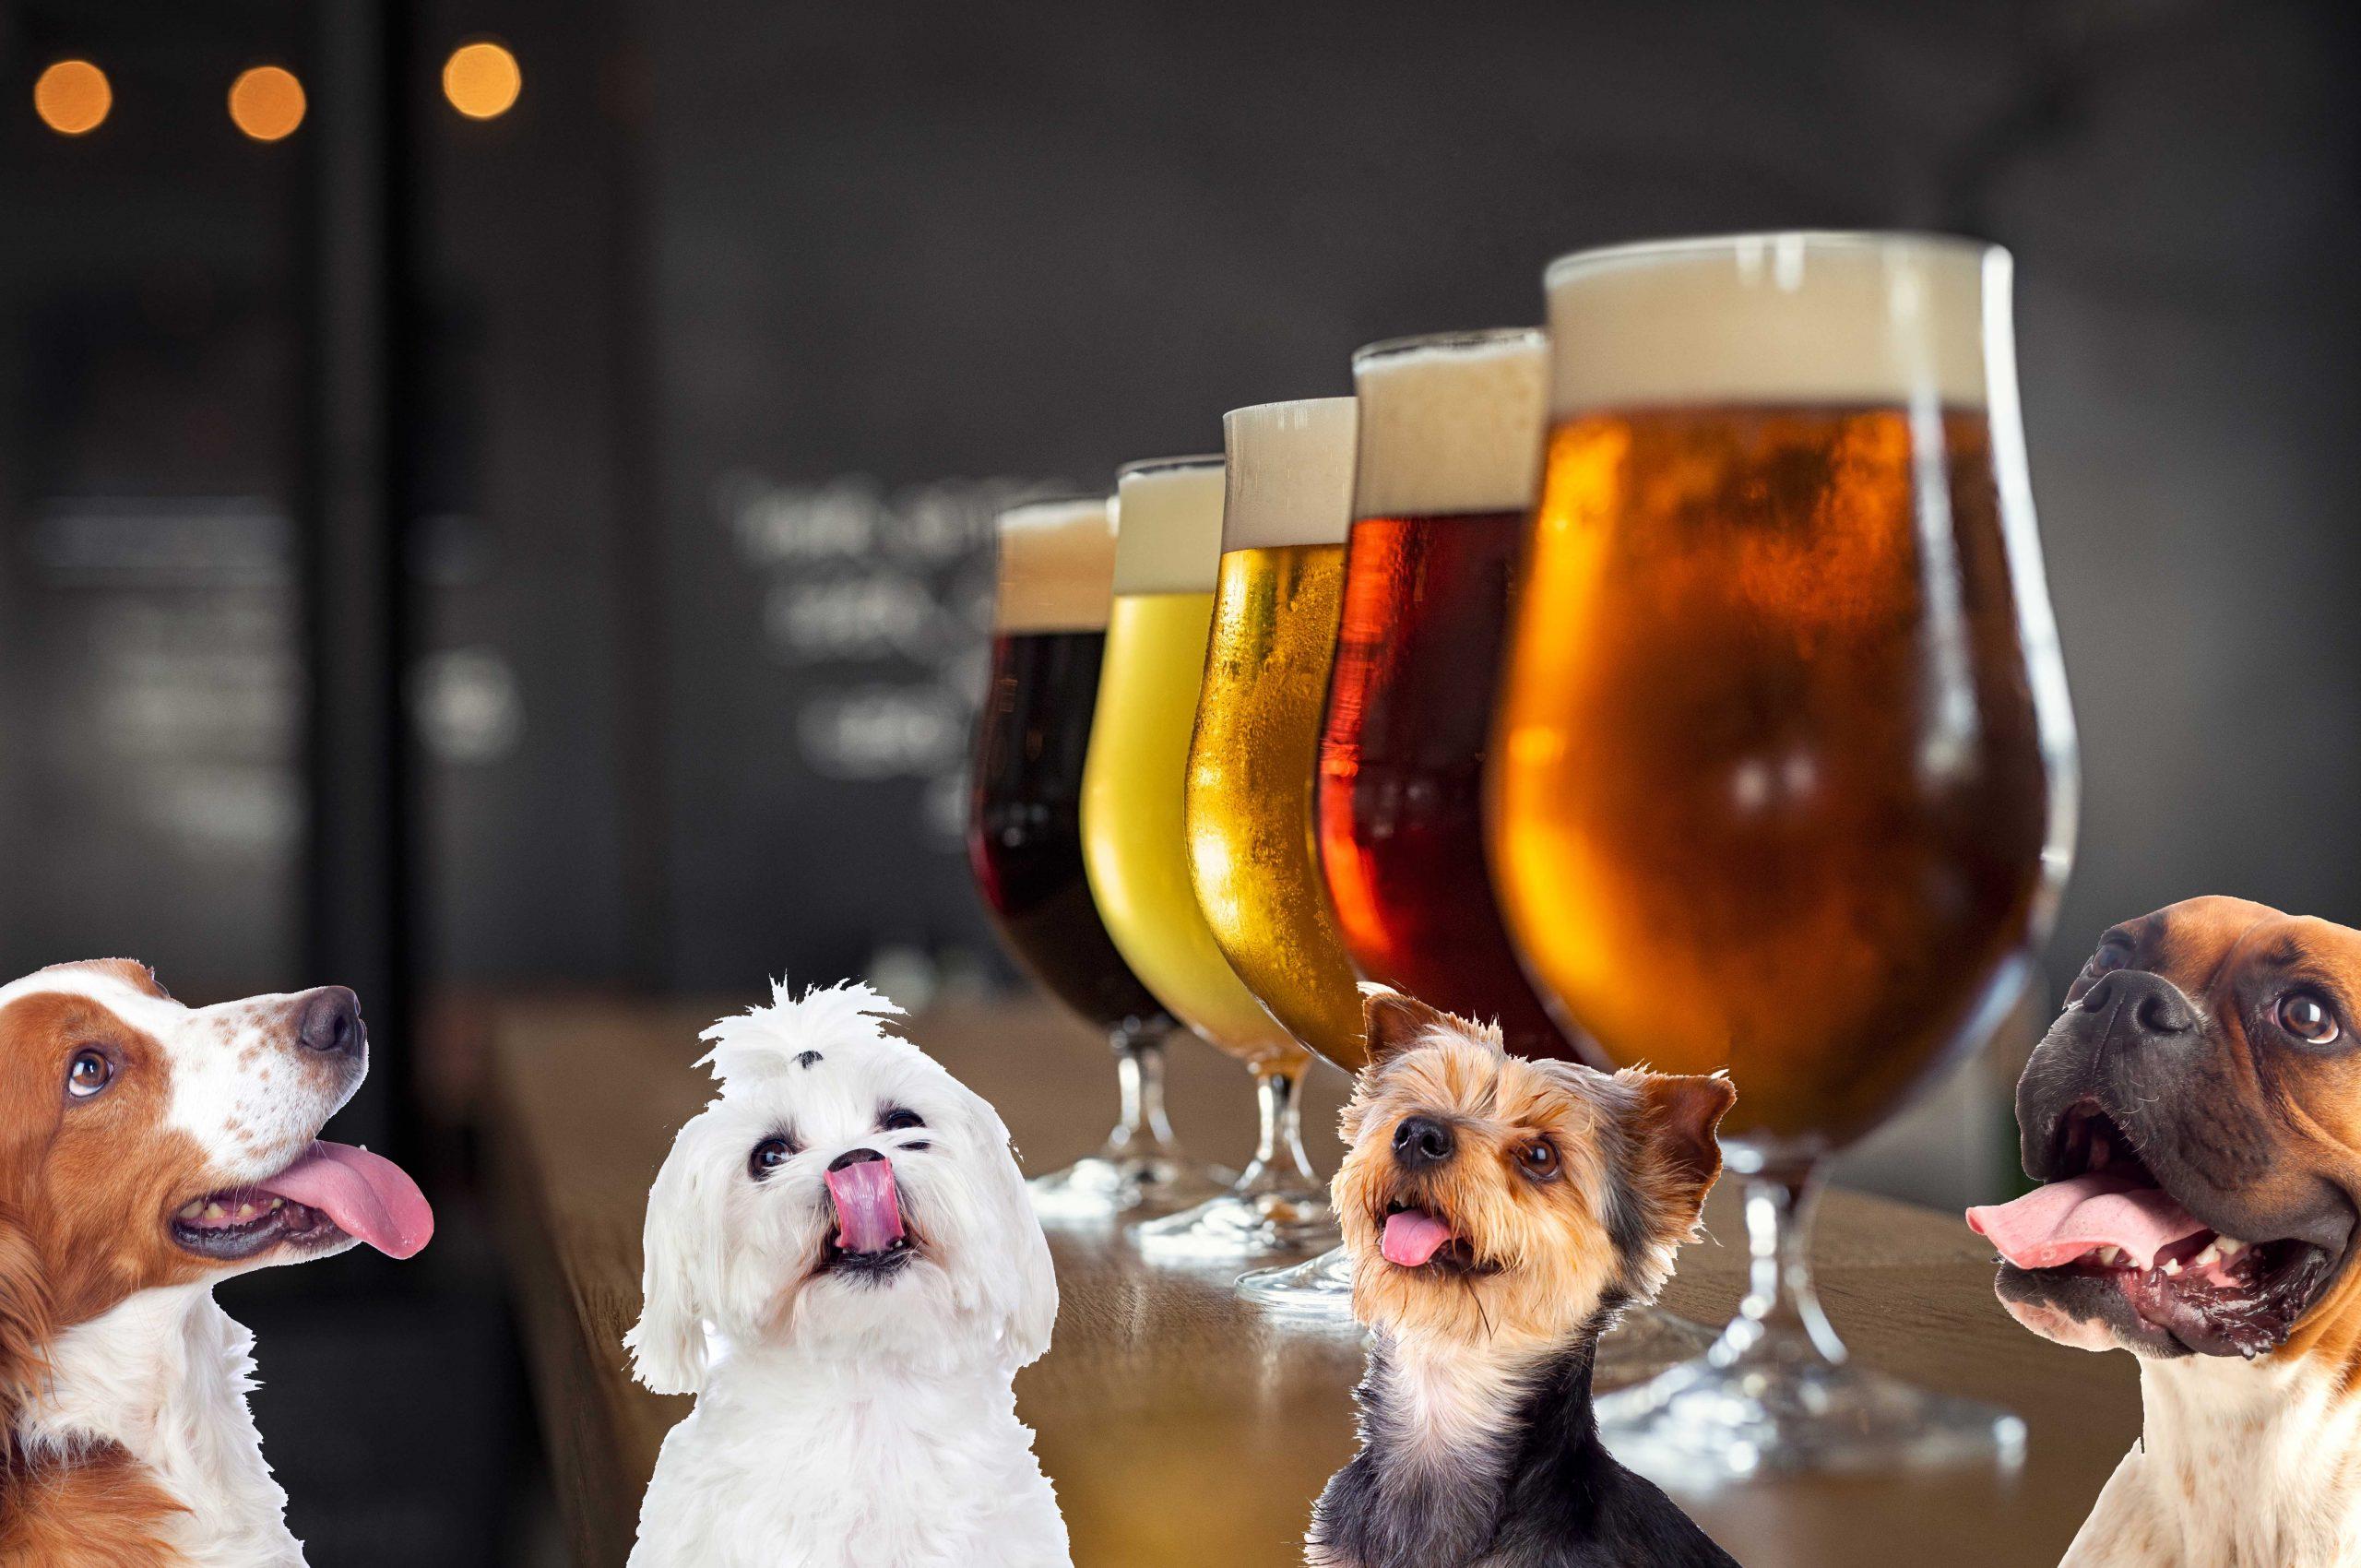 Empresa te regala 3 meses de cerveza si adoptas un perrito